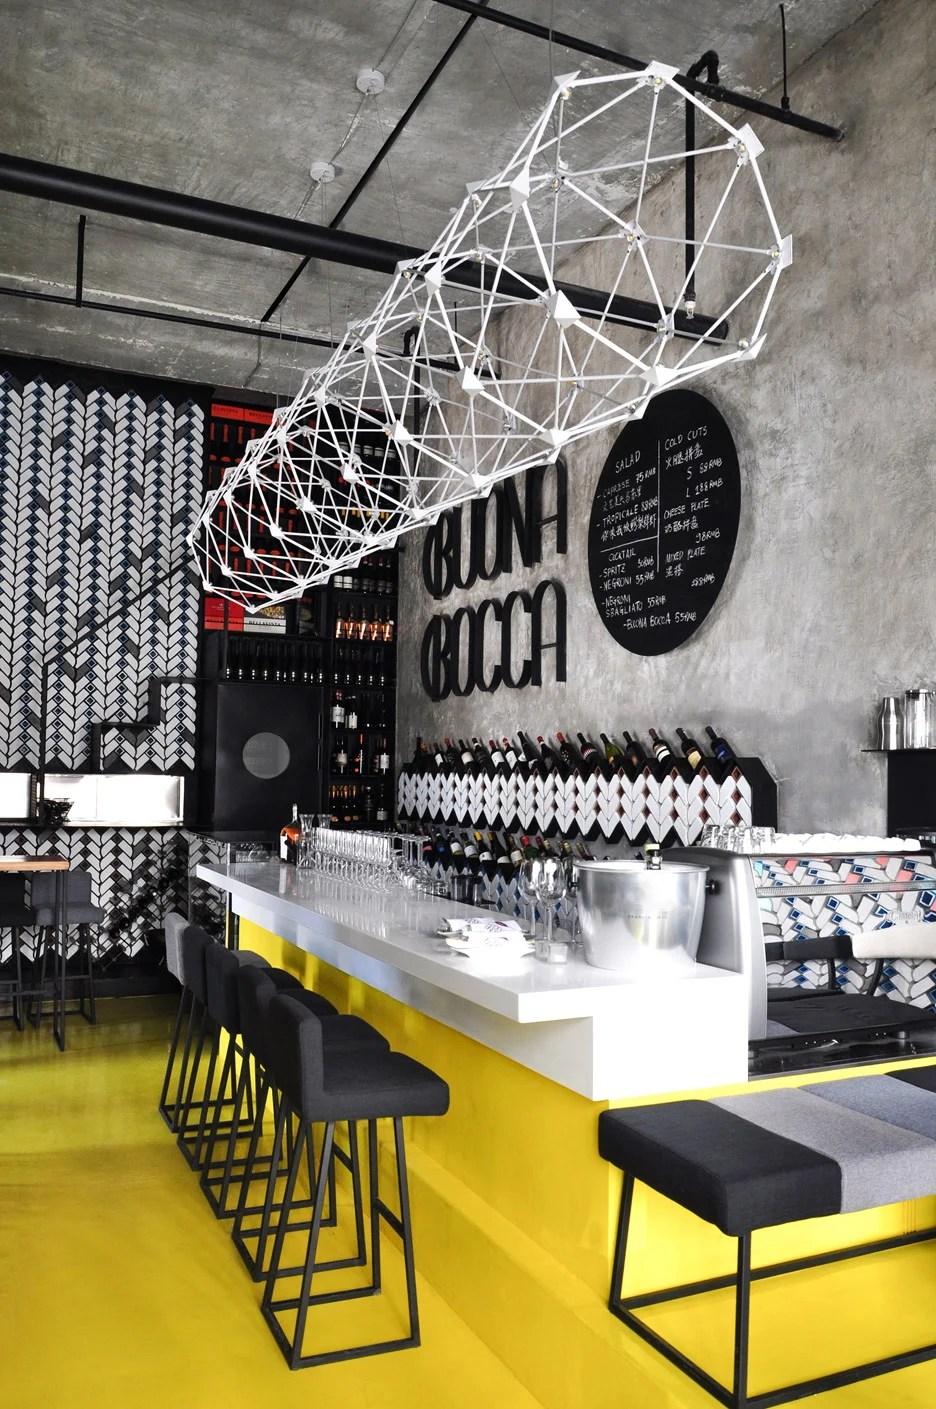 Beijing bar by Studio Ramoprimo has chevronpatterned walls